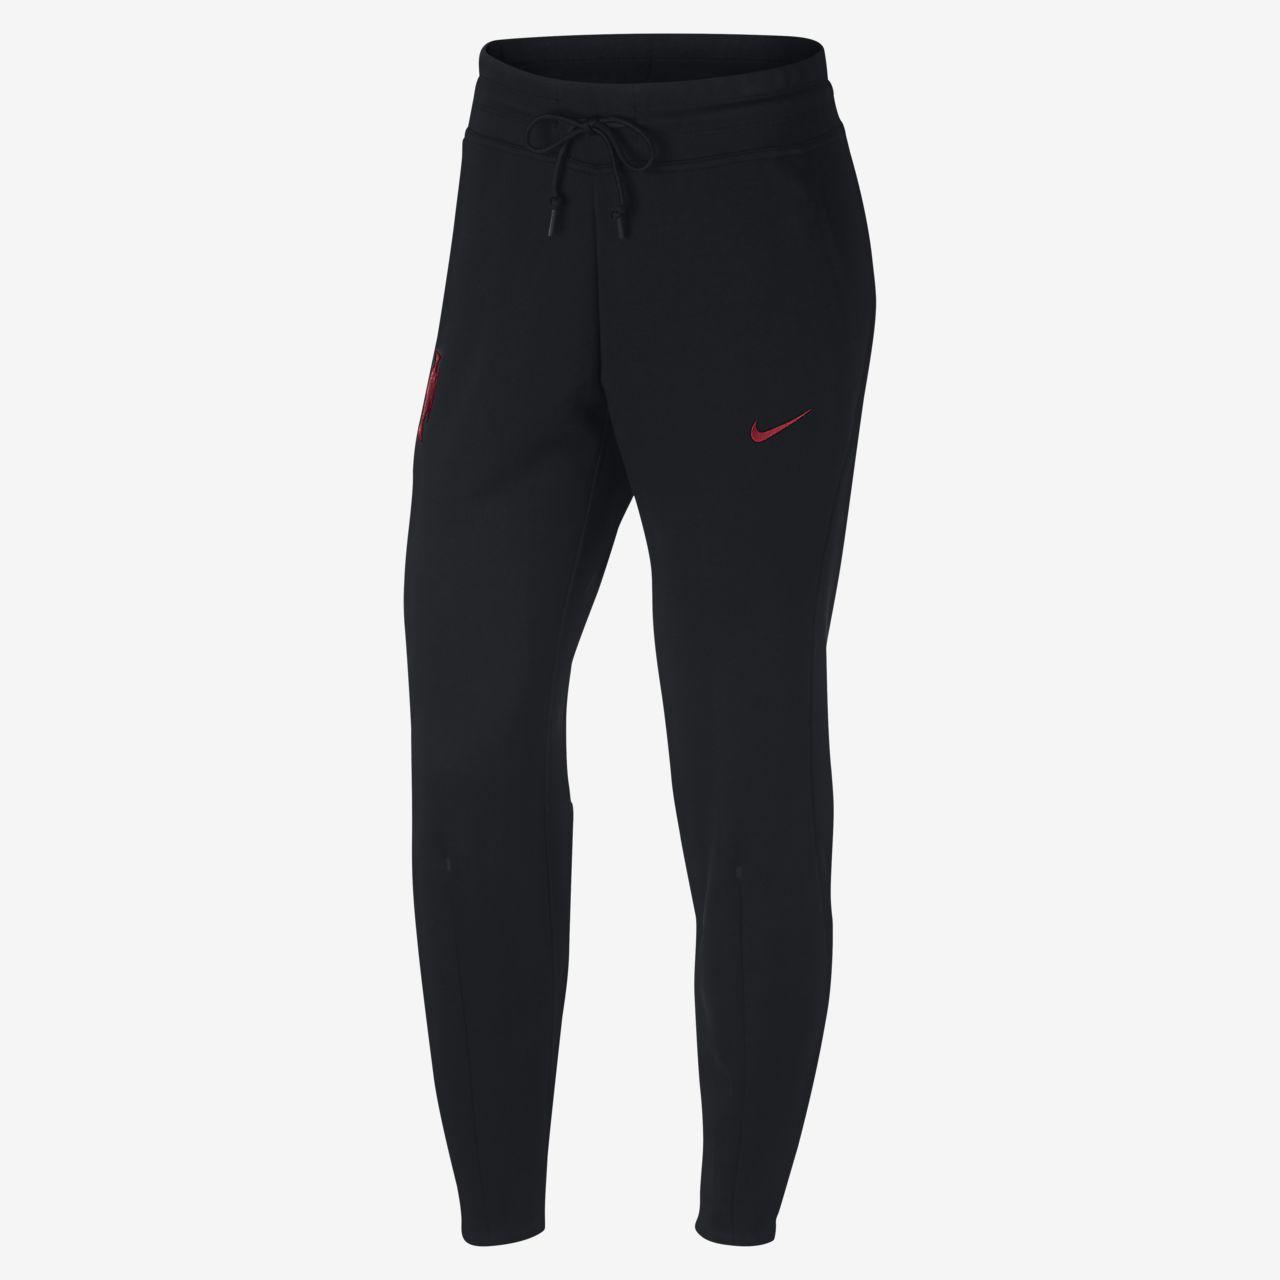 9056965433c Dámské kalhoty Portugal Tech Fleece. Nike.com CZ